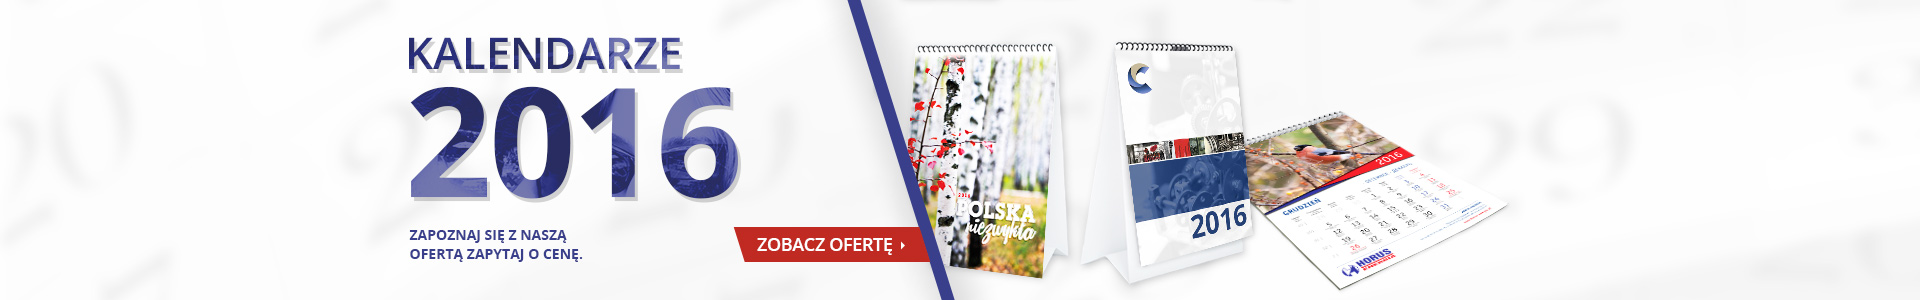 slider-kalendarz